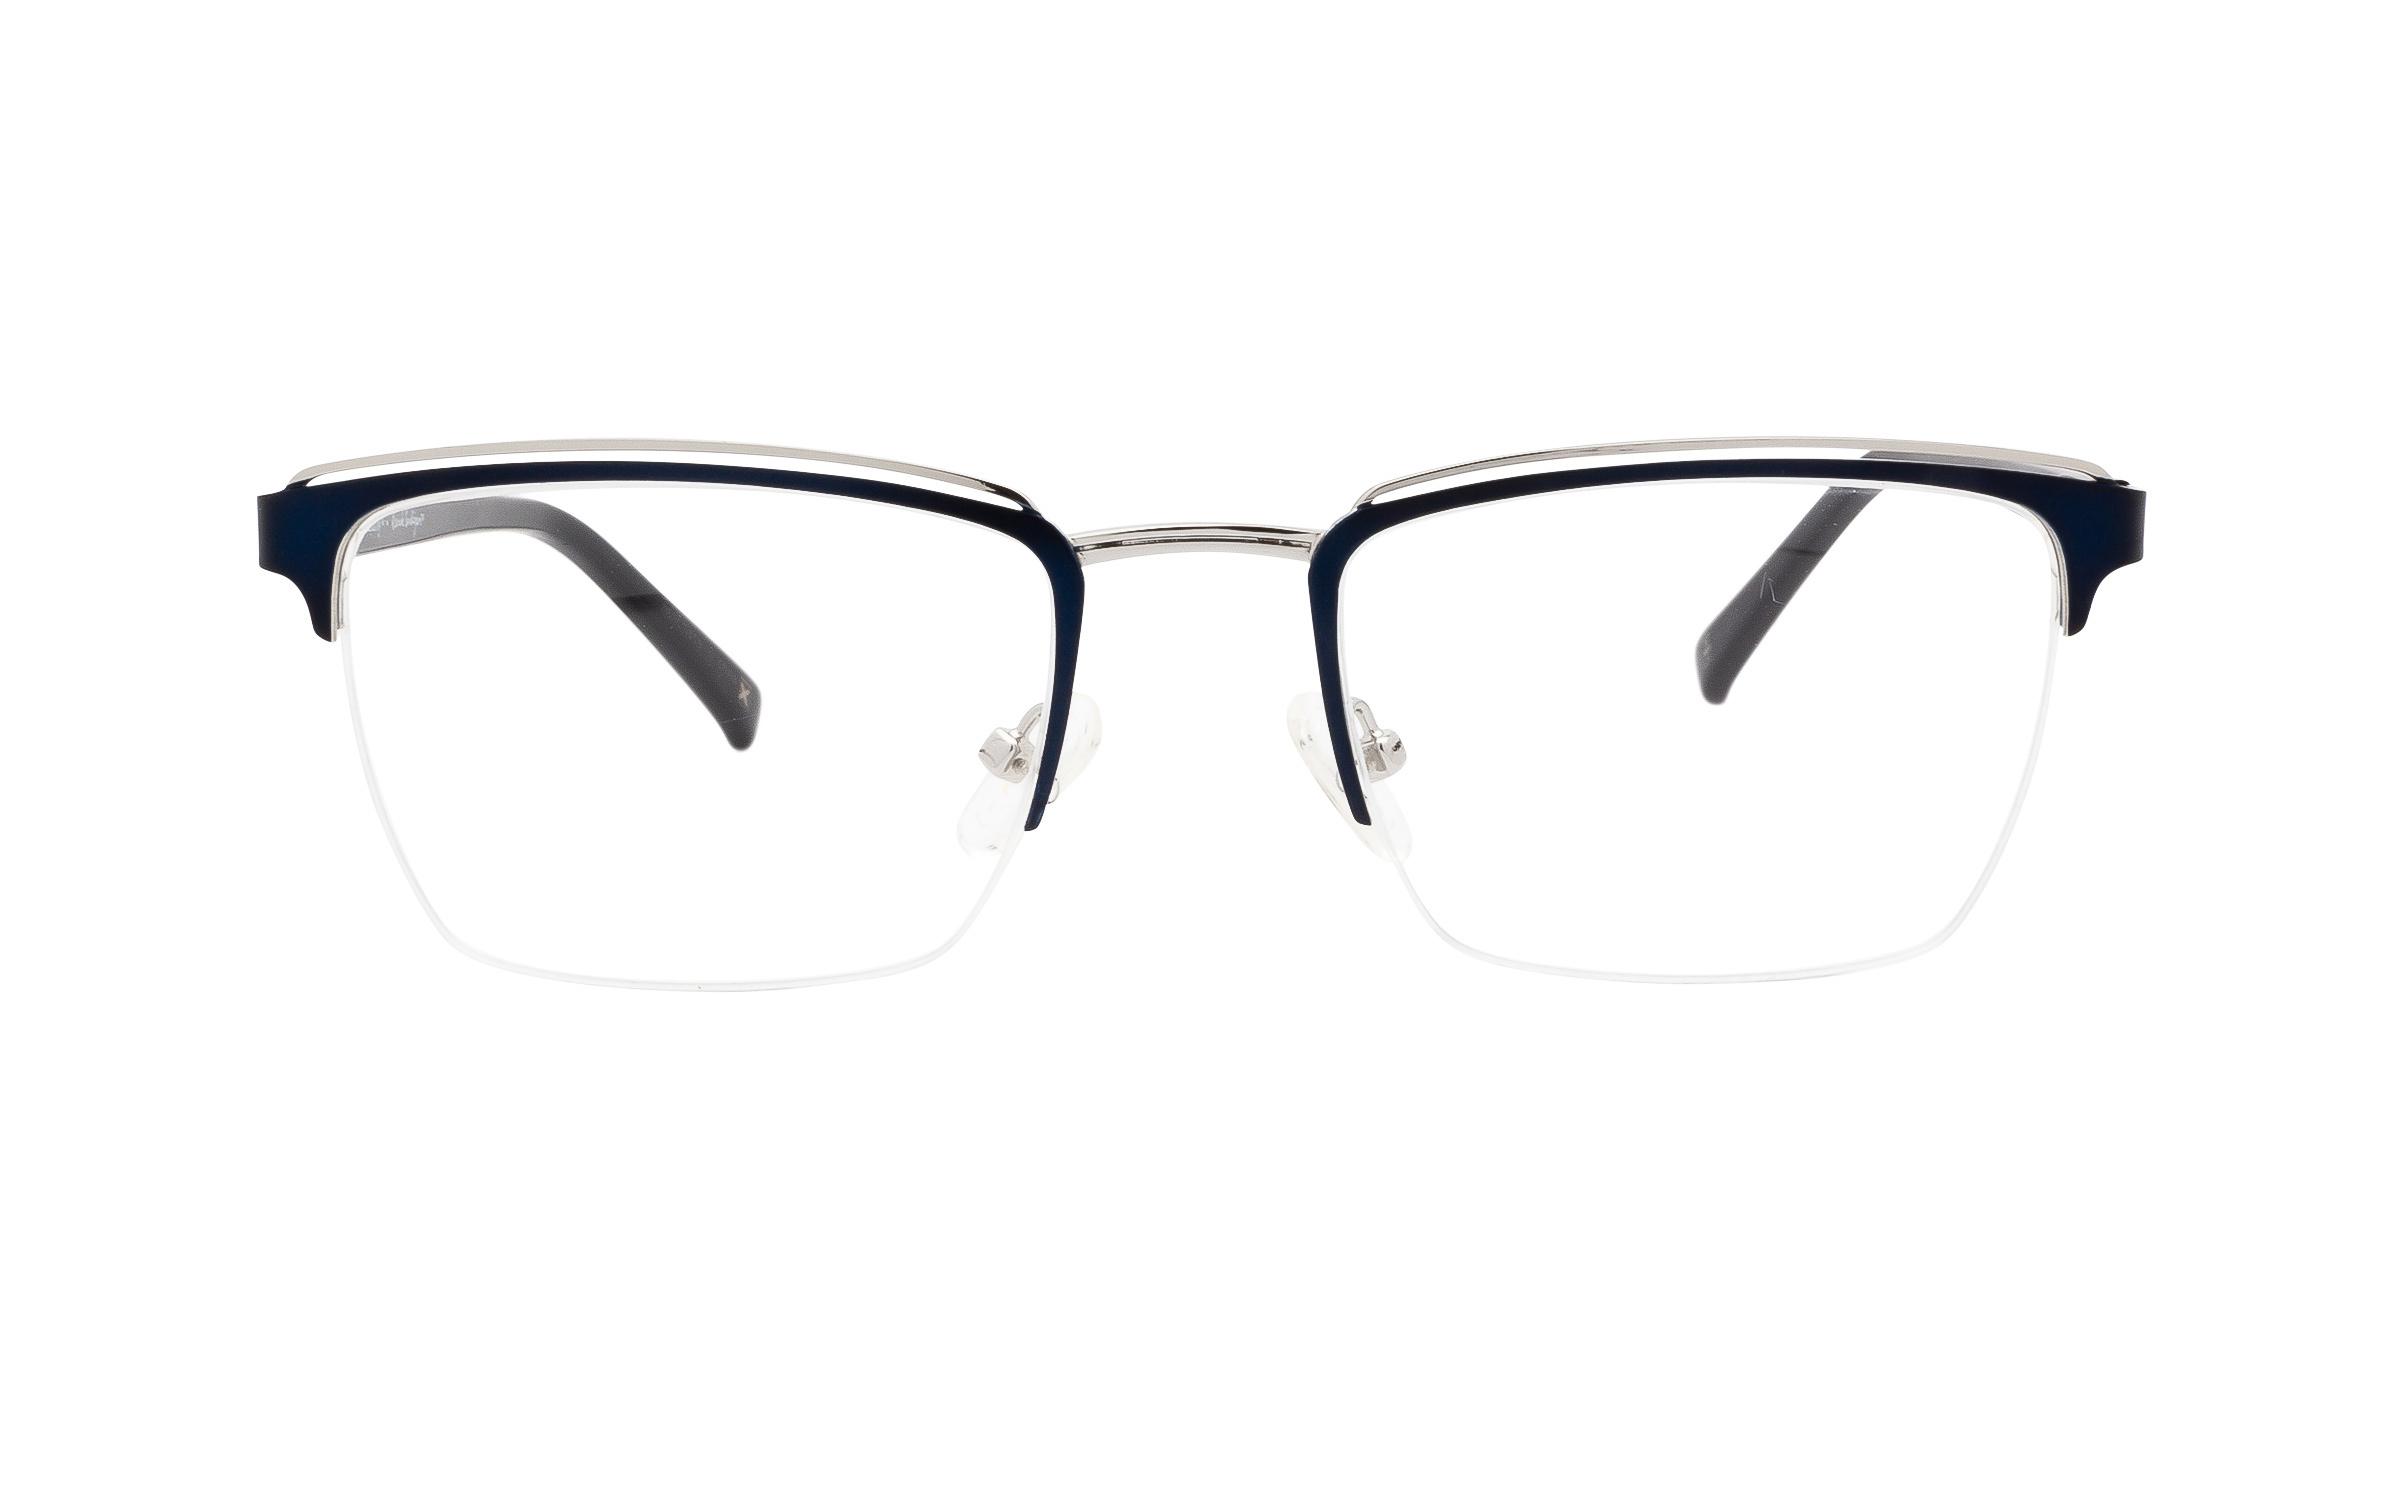 http://www.coastal.com/ - Derek Cardigan Naos DC223 C03 (51) Eyeglasses and Frame in Navy Blue/Silver | Acetate – Online Coastal